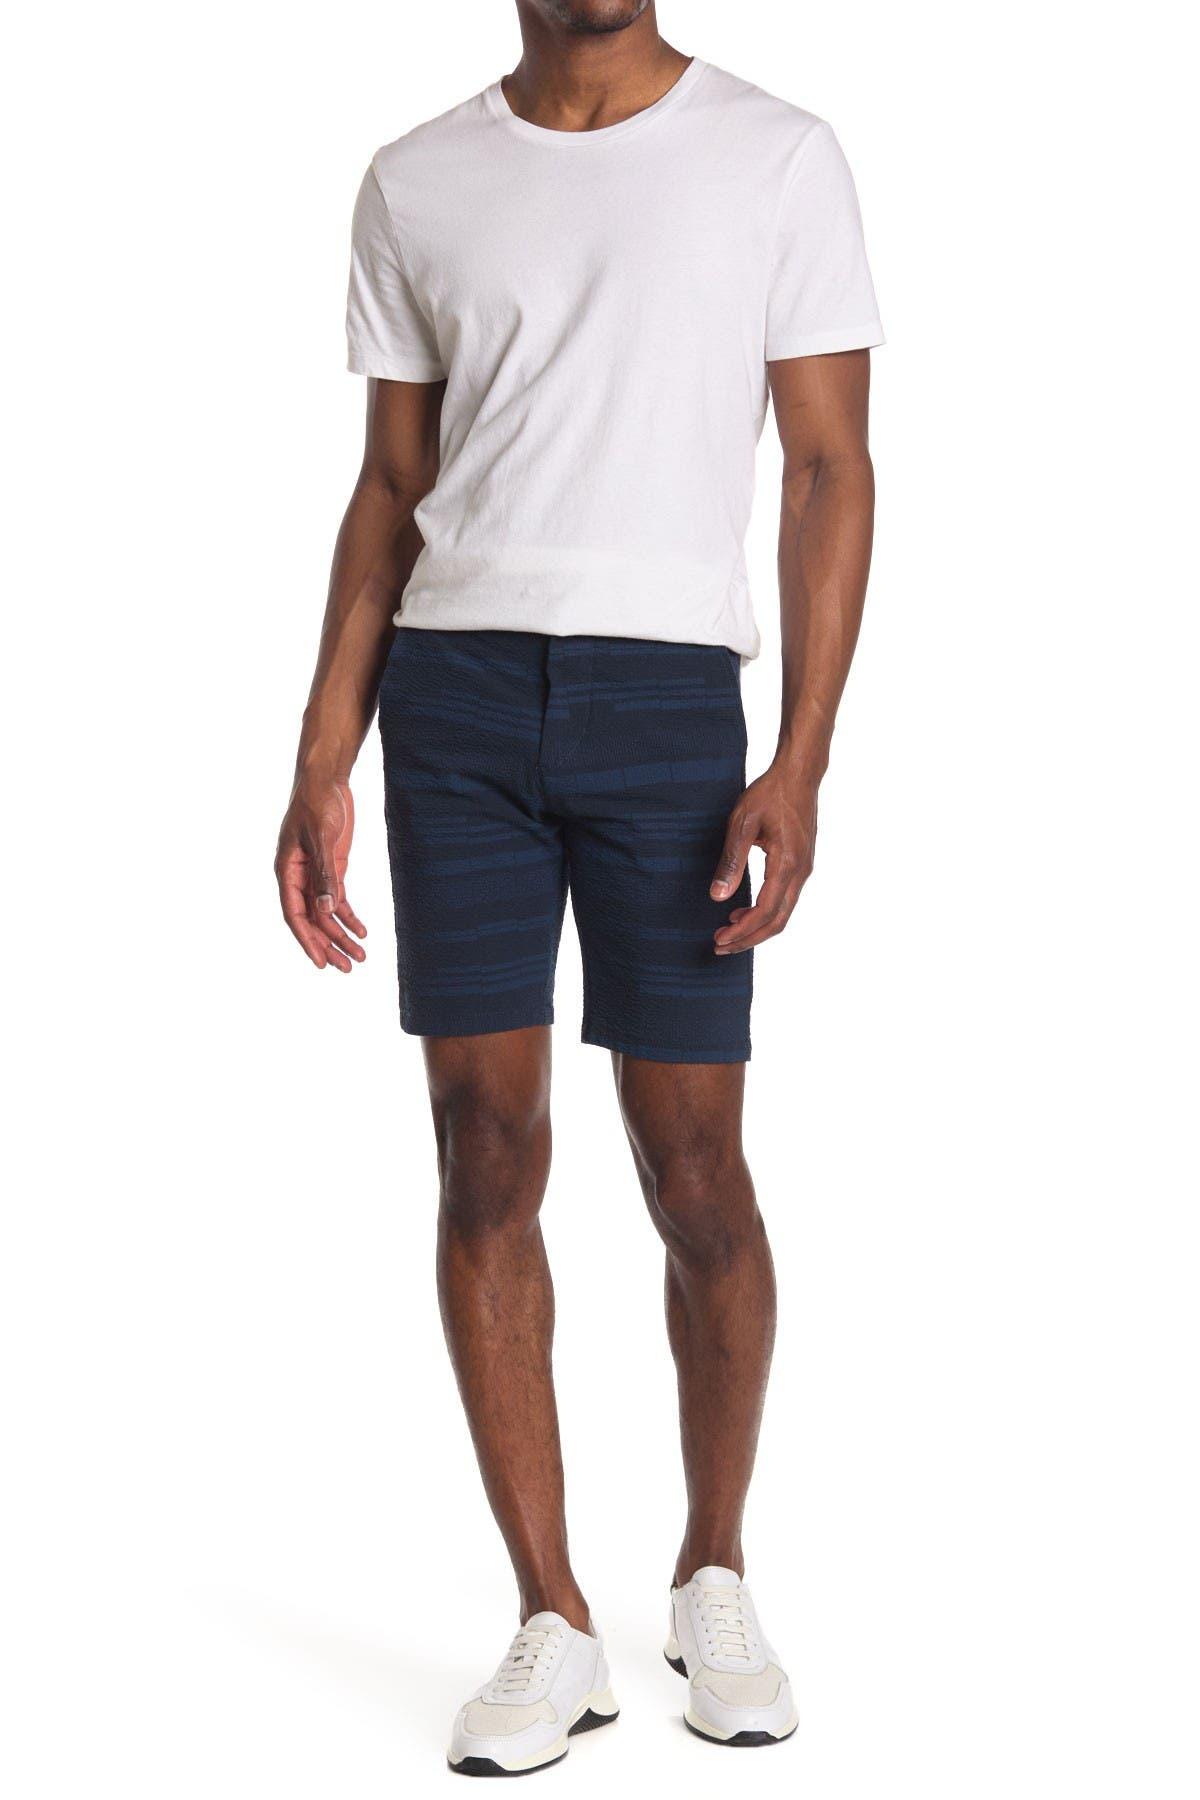 Image of NN07 Crown Stripe Shorts